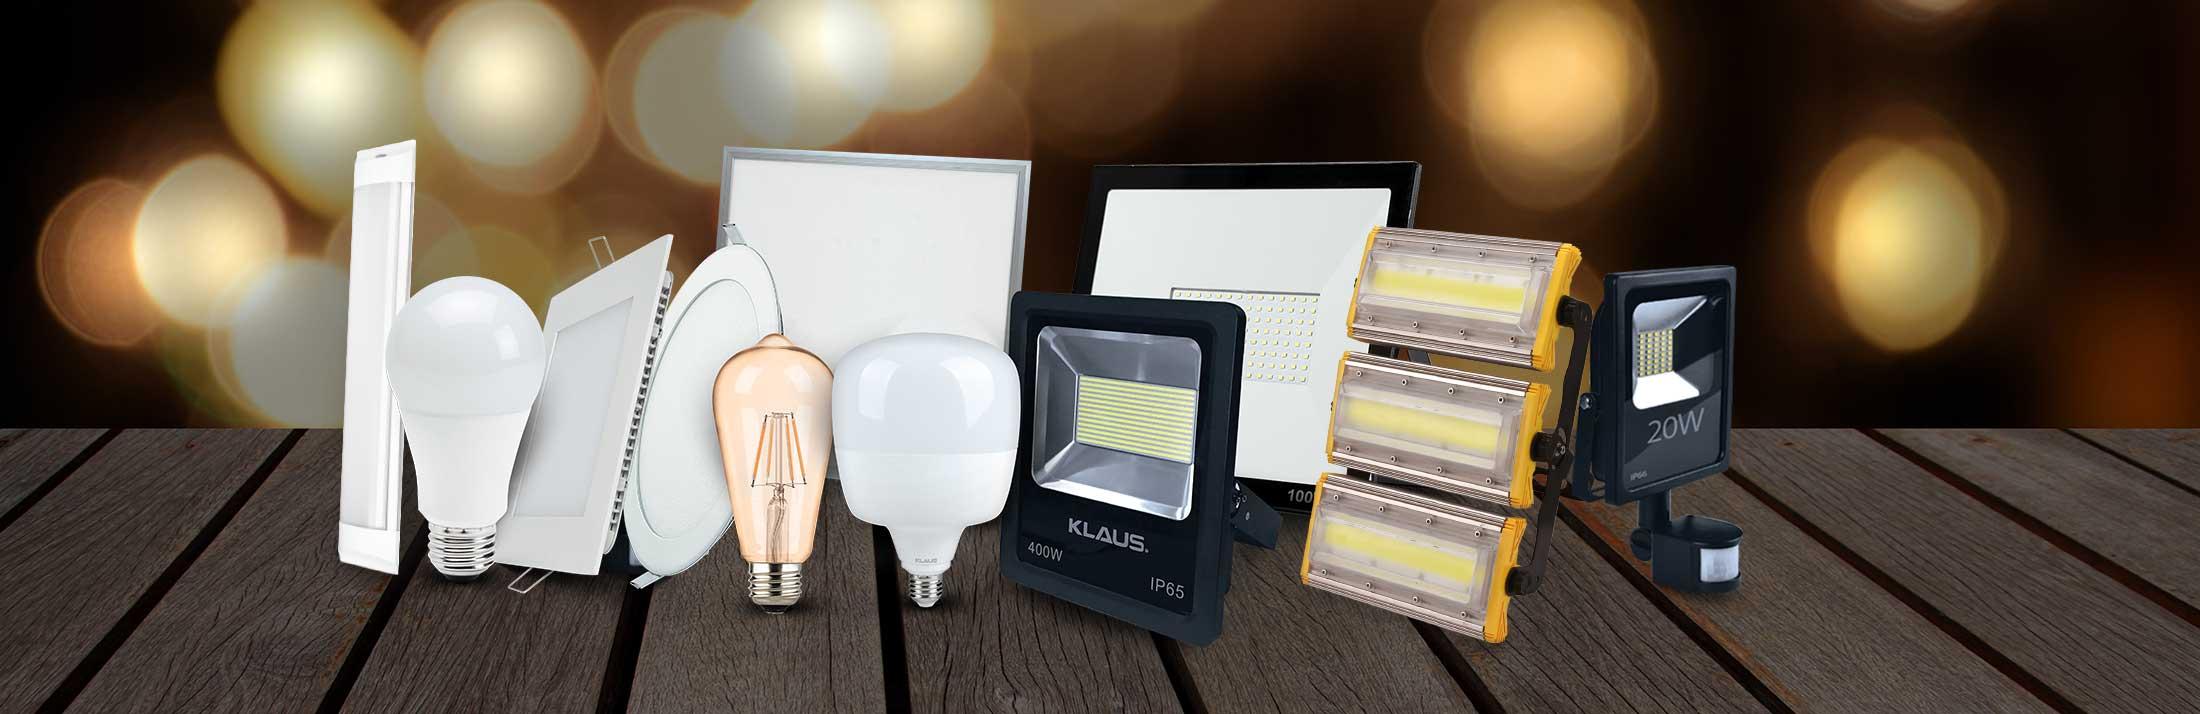 super popular b26bf 2ba51 KLAUS Electric, Led Lighting Equipments